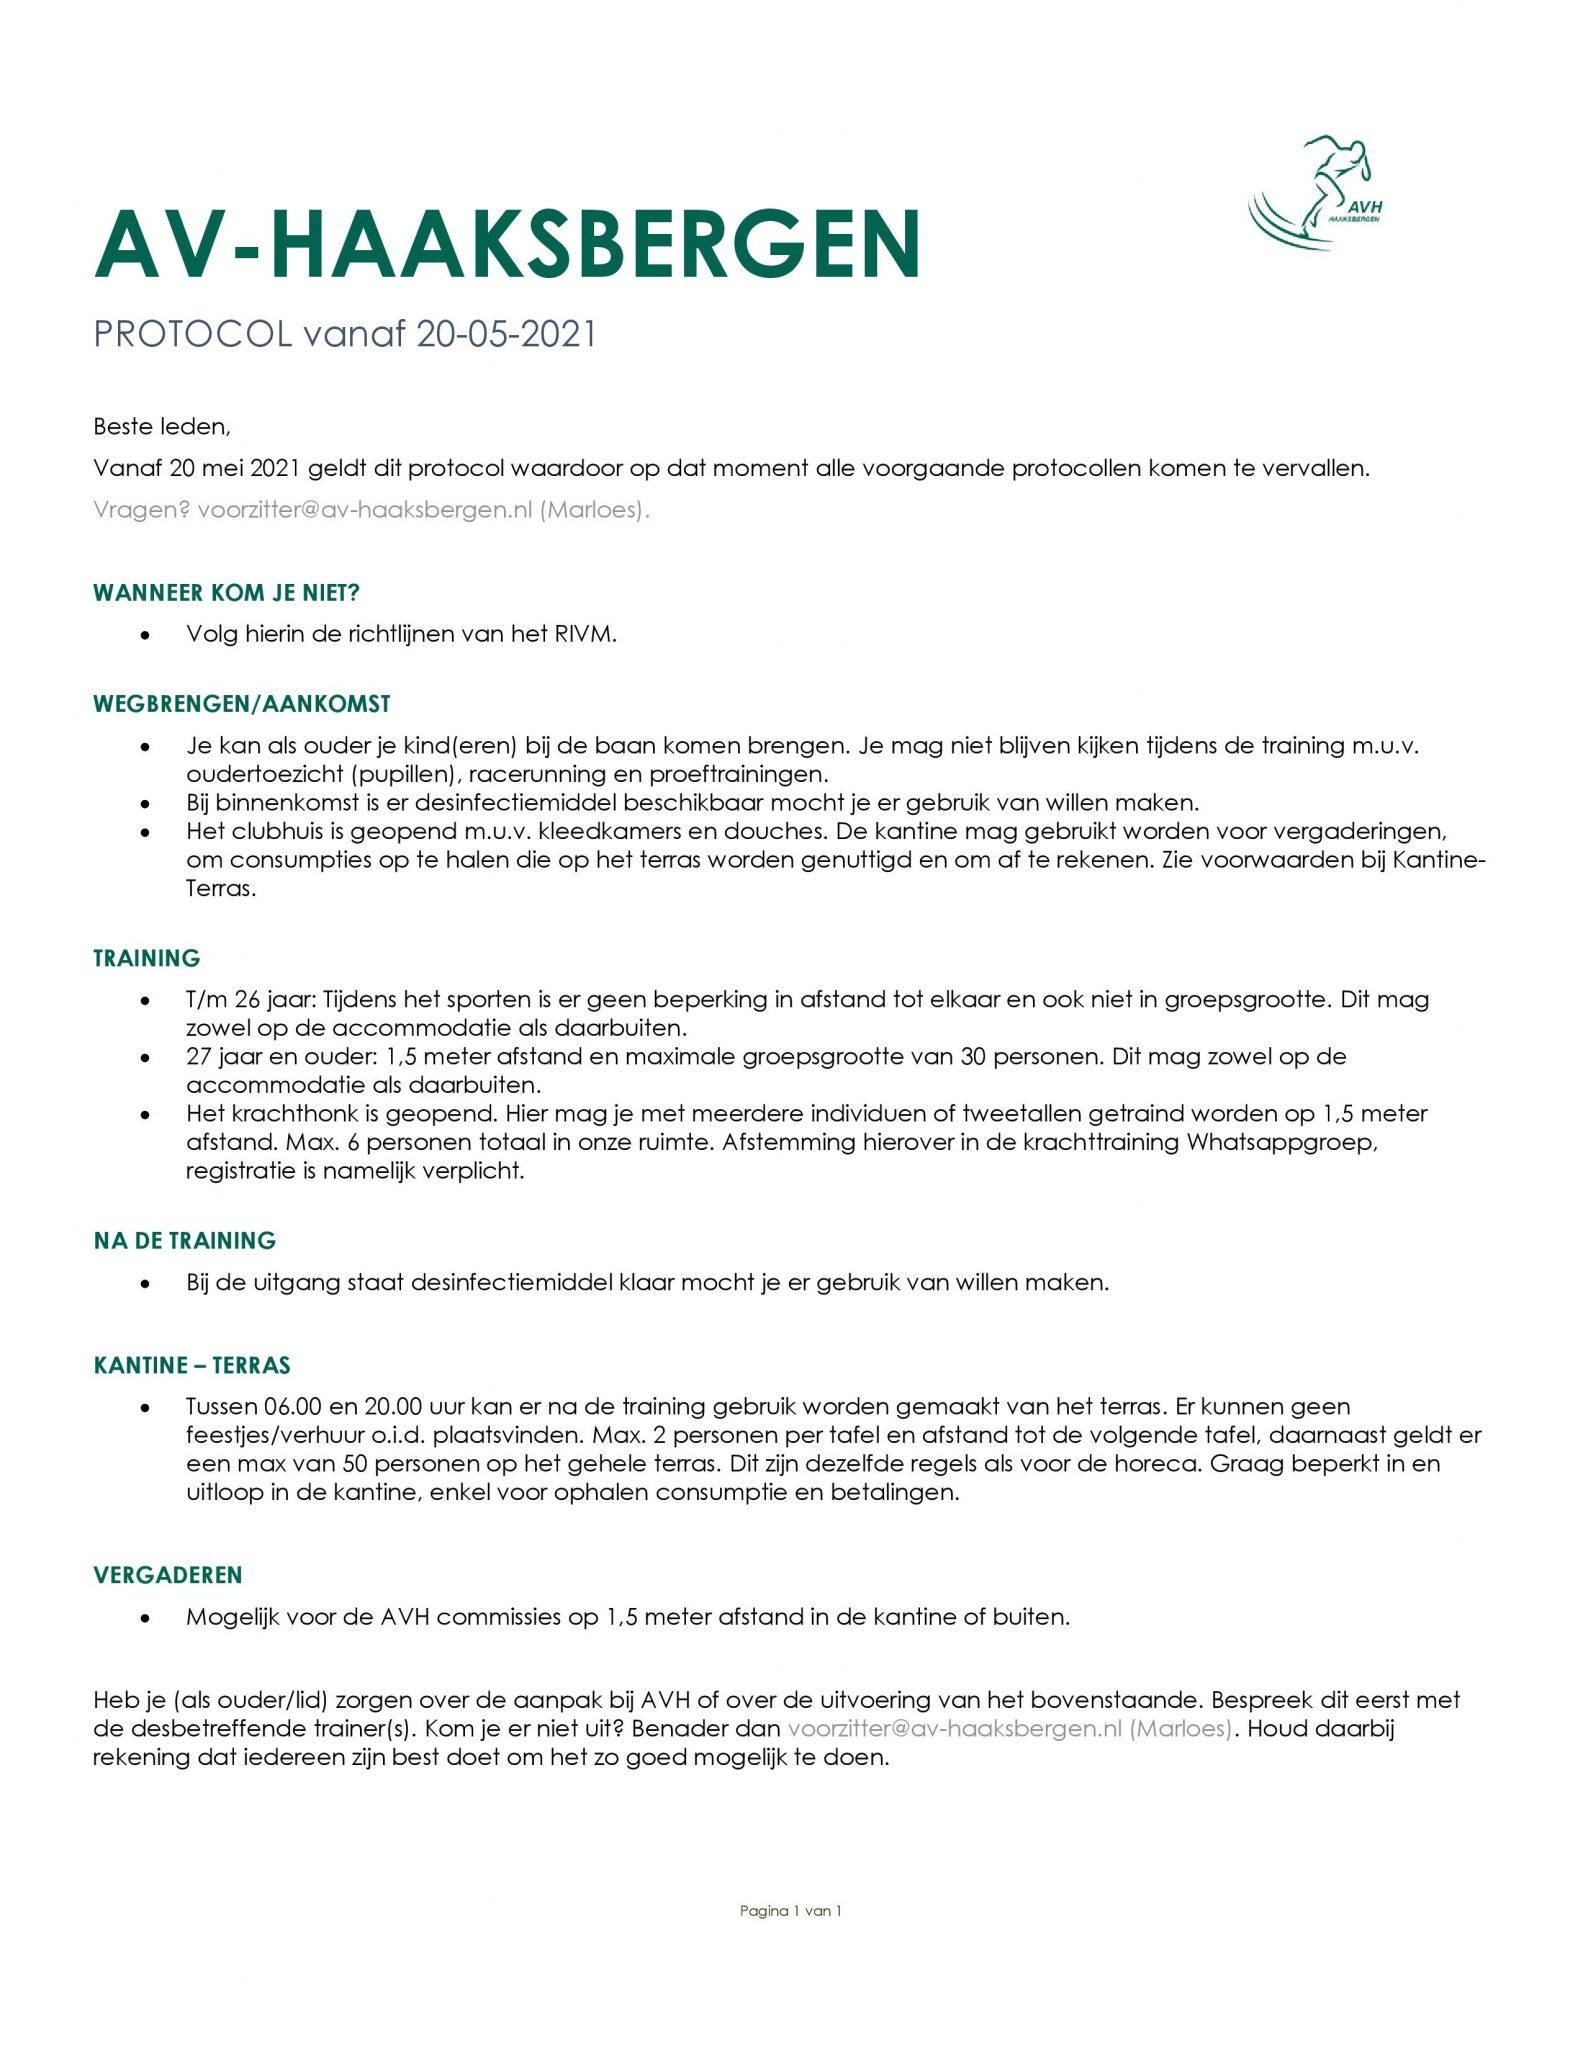 AVH Corona protocol per 20 mei 2021.